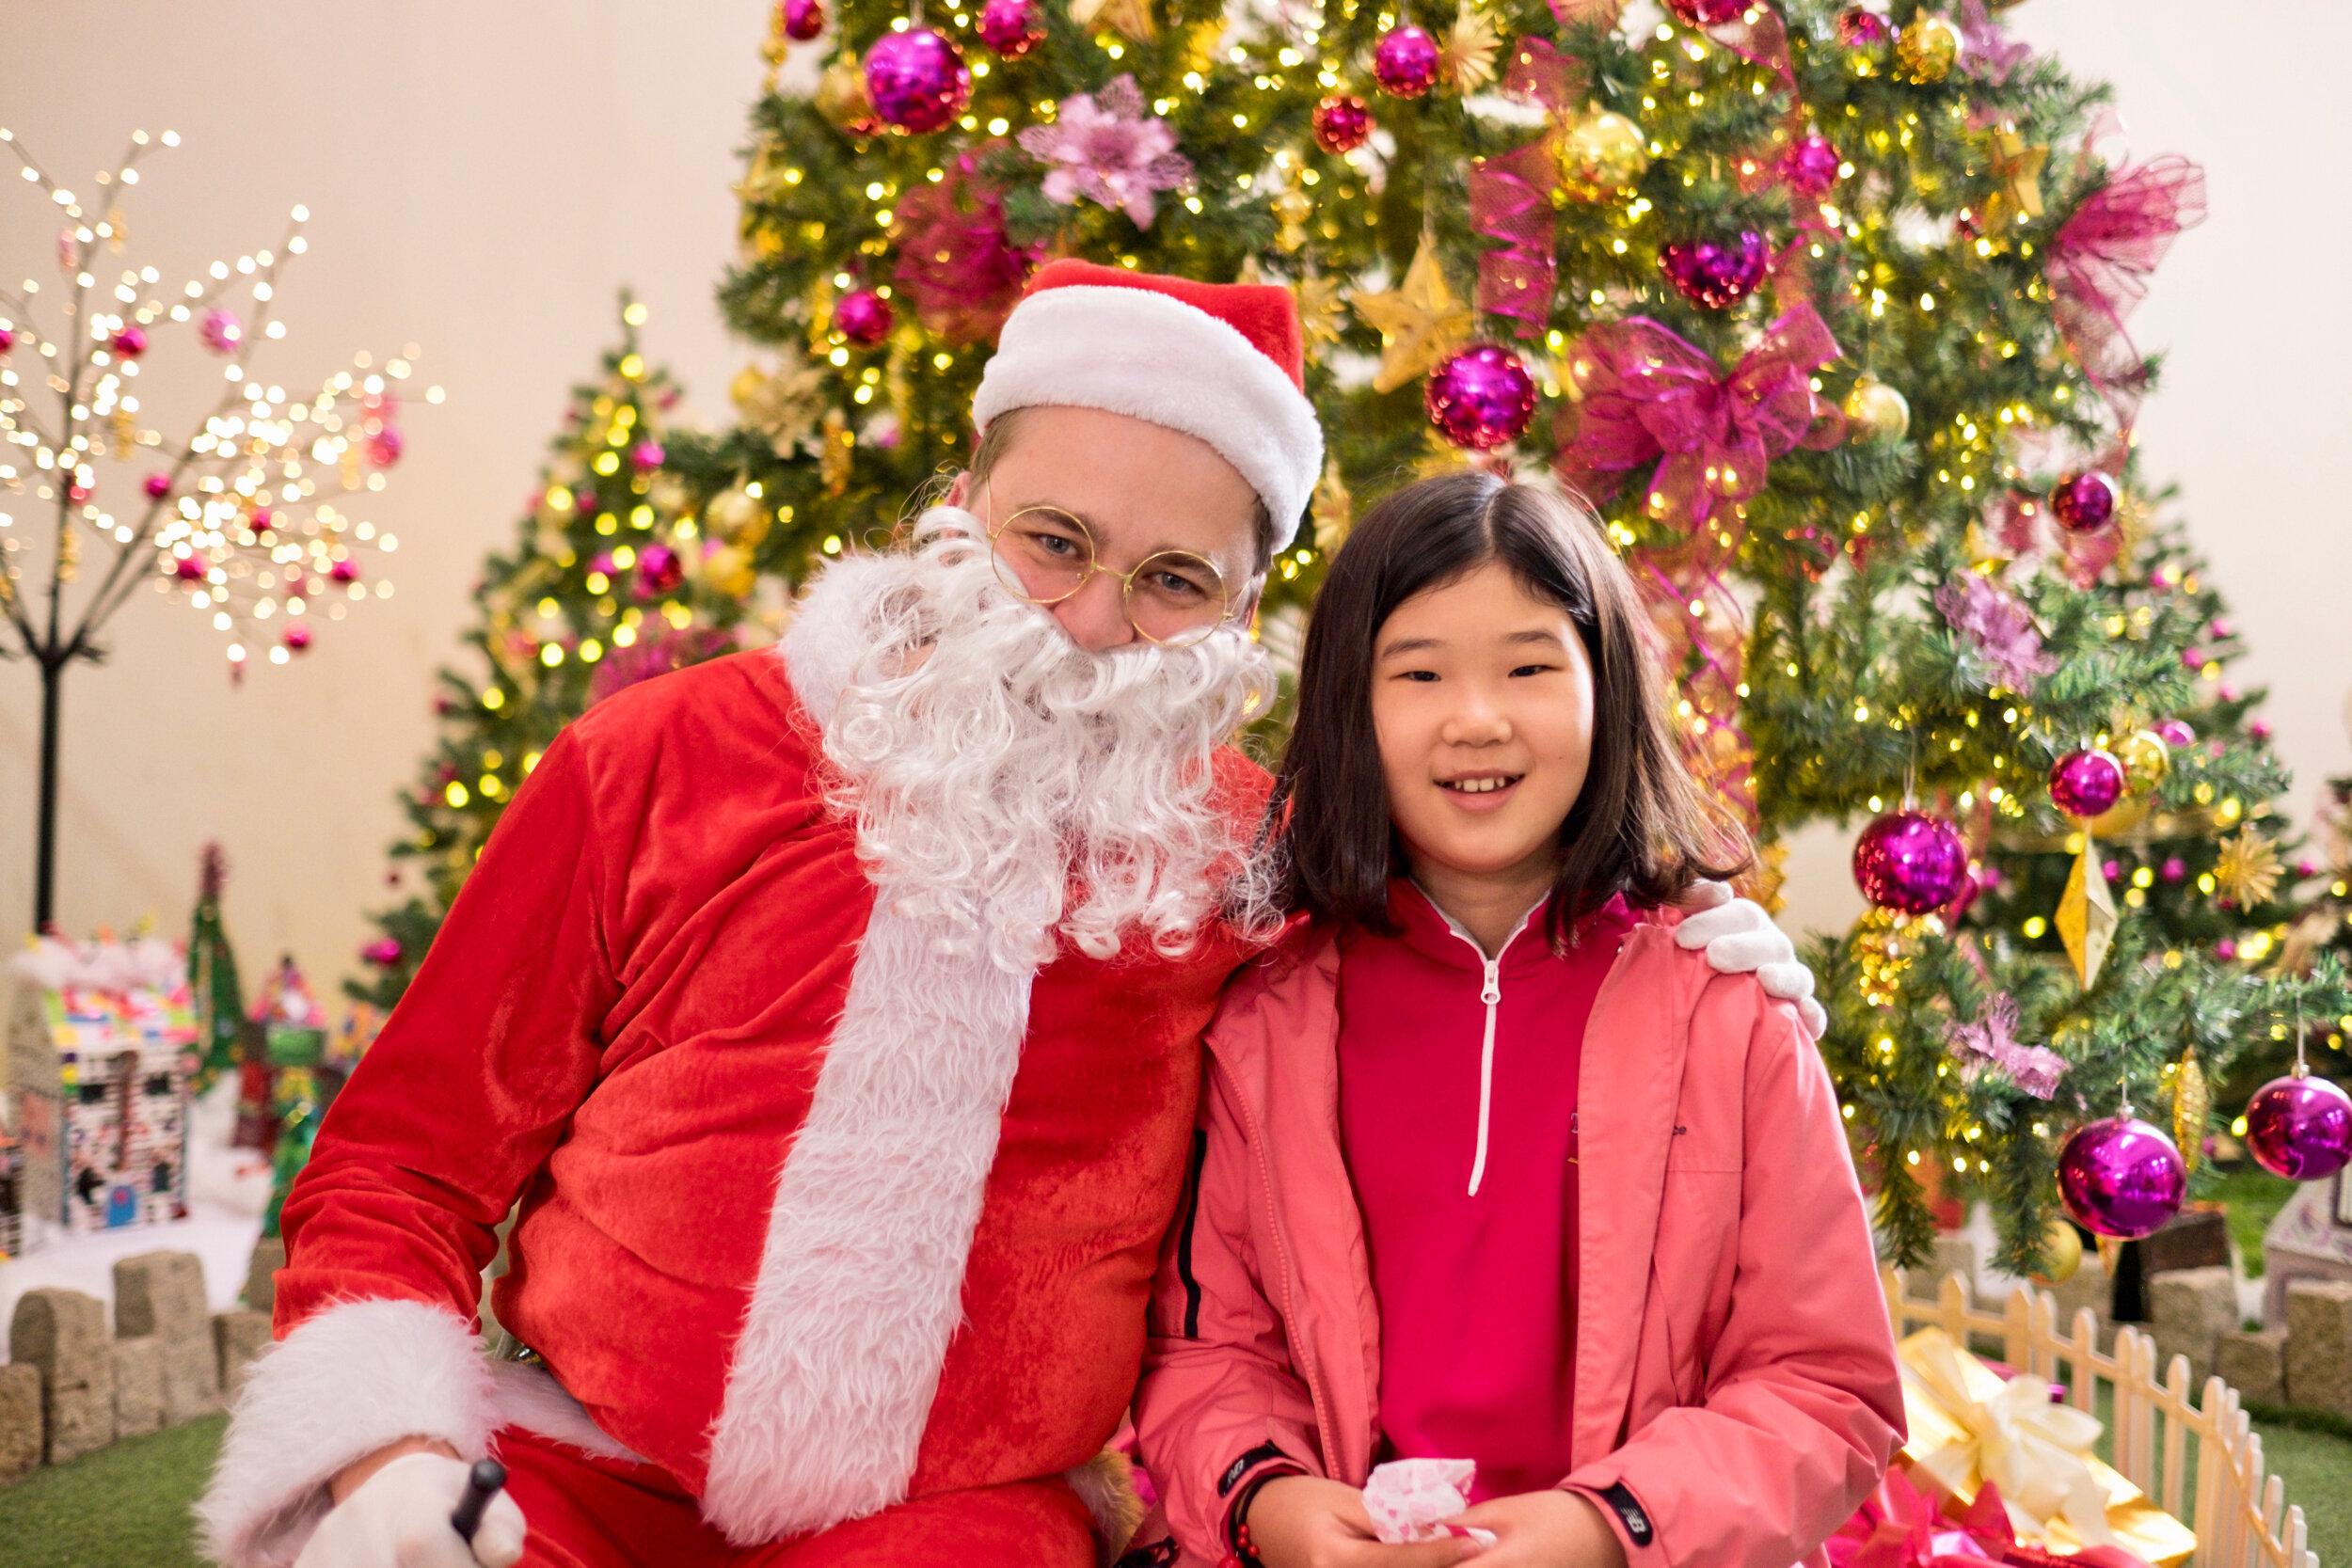 Photoshoot with Santa Clause-869.jpg